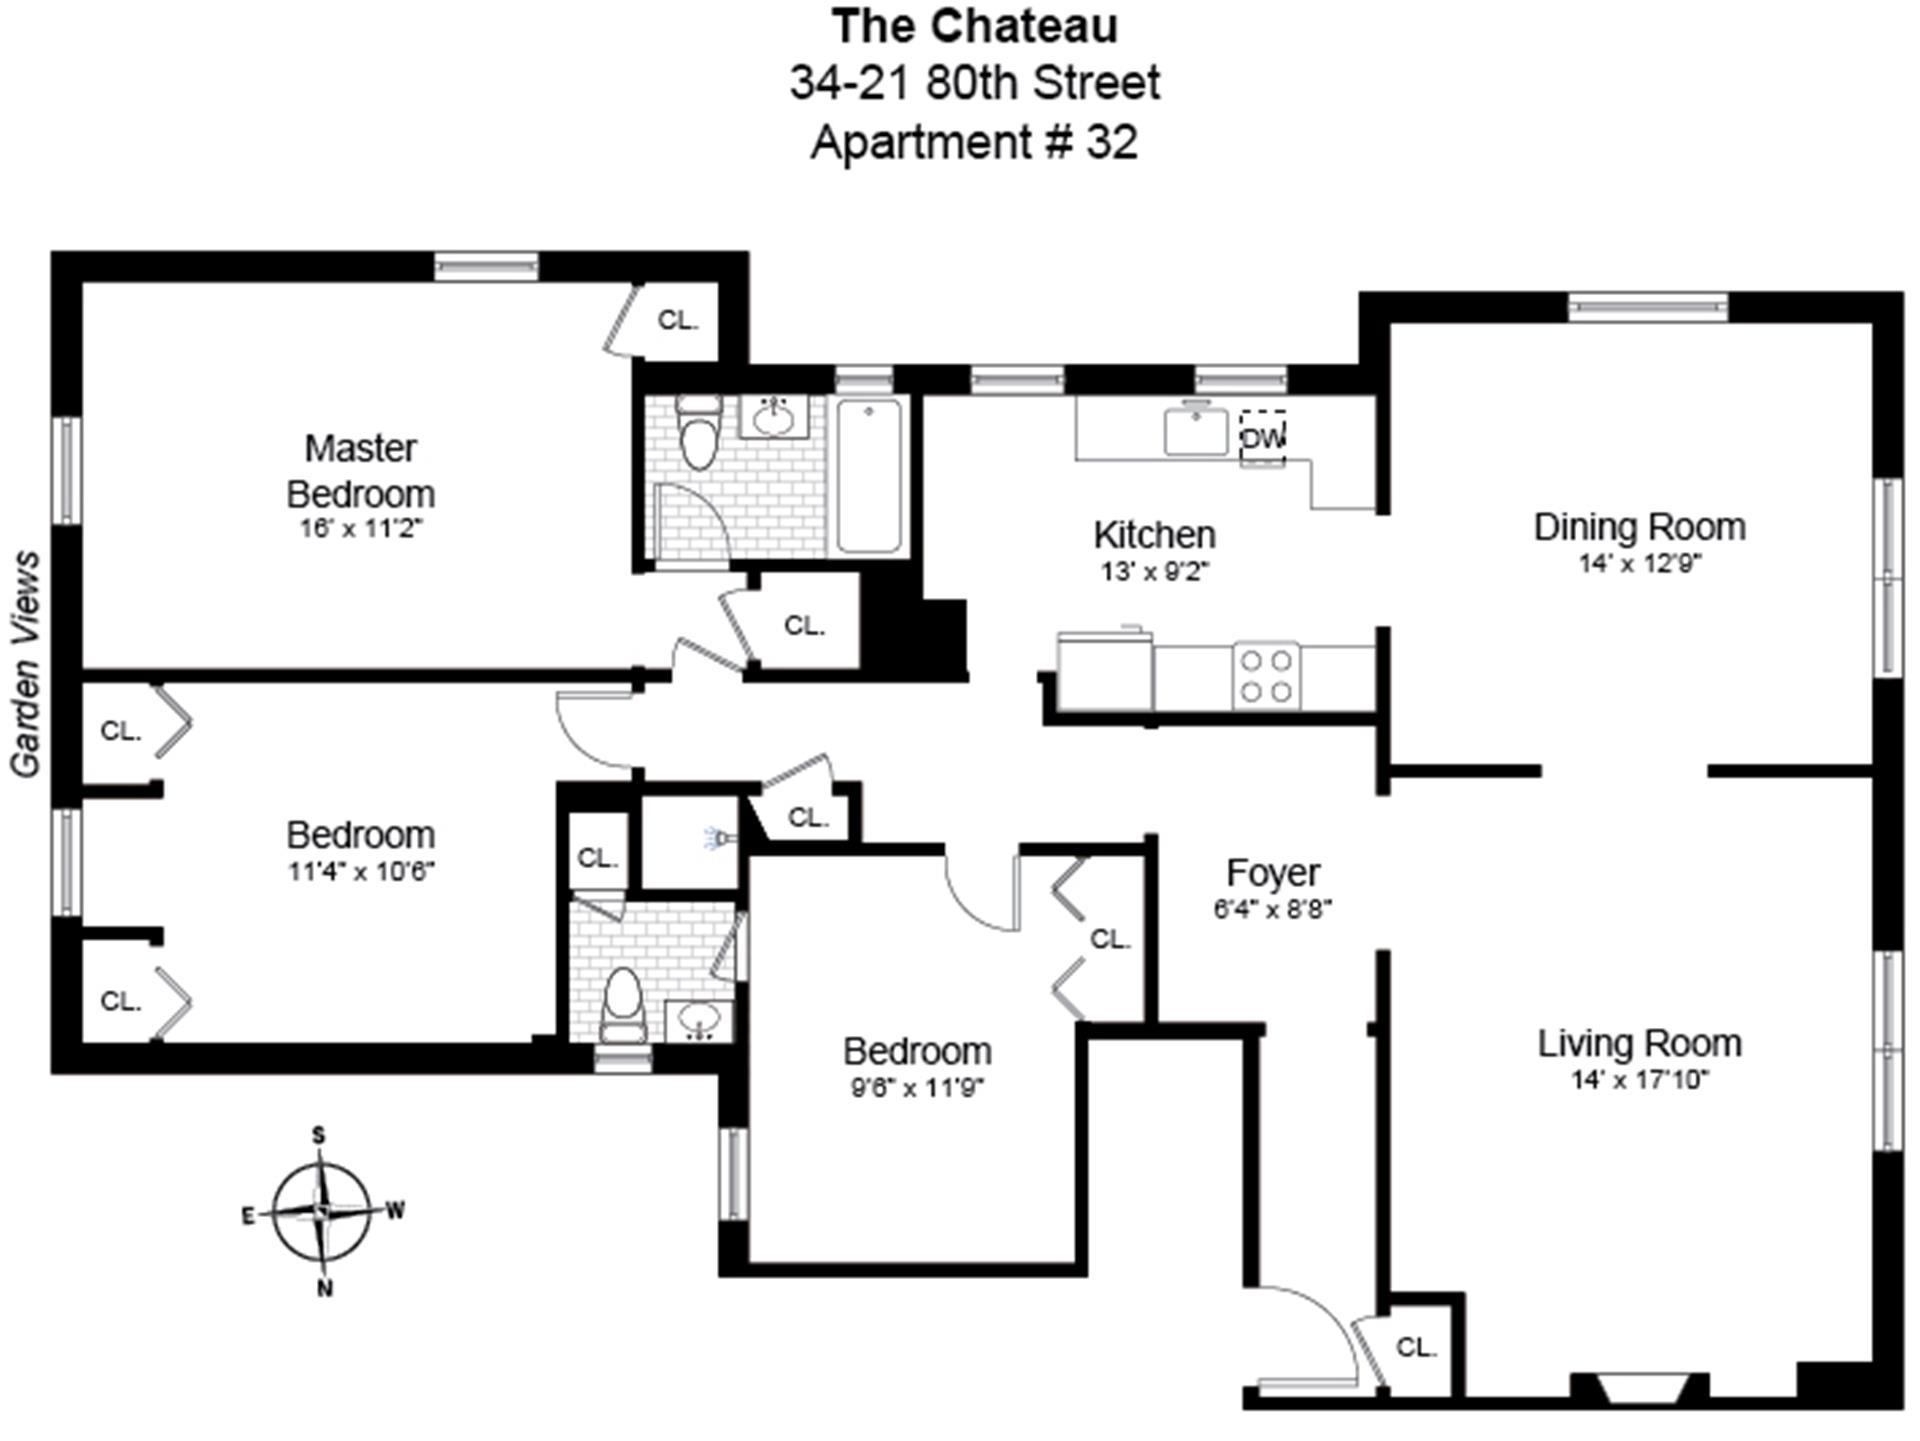 Floor plan of 34-21 80th St, 32 - Jackson Heights, New York